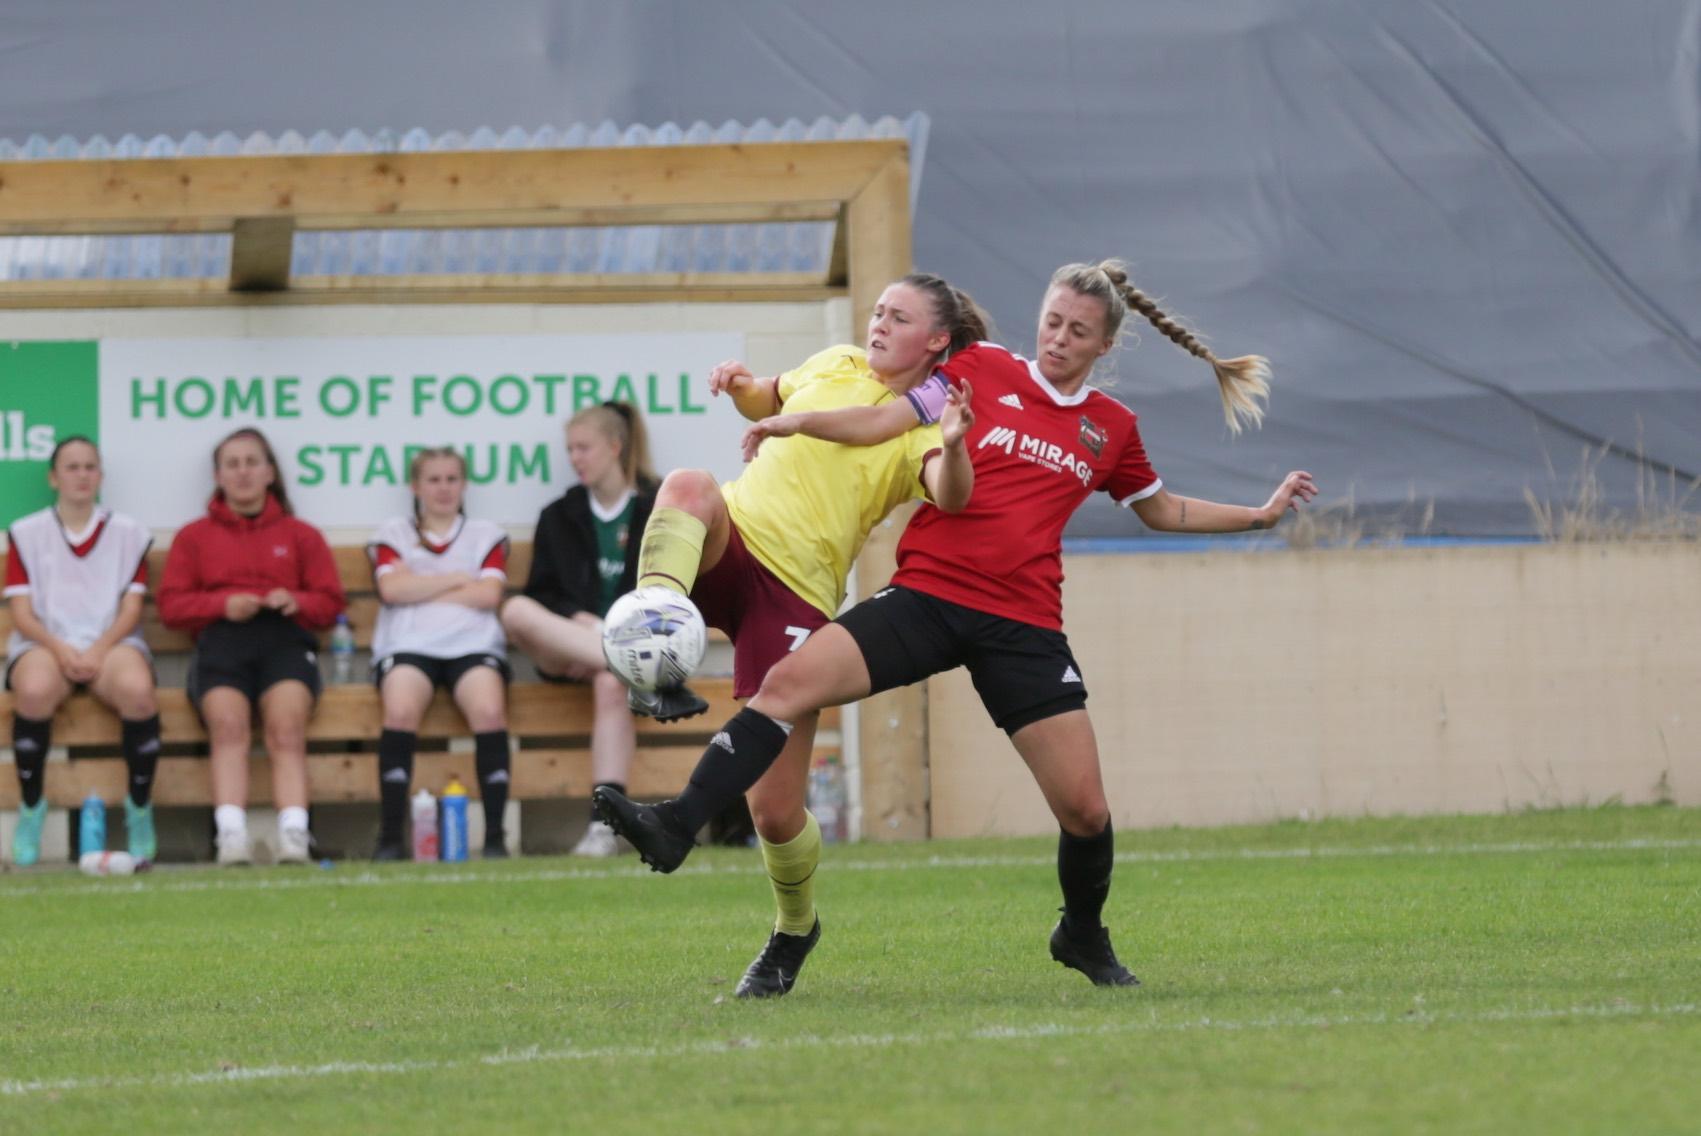 Millie Ravening Burnley Nicole Kemp Sheffield | Últimas Noticias Futbol Mundial